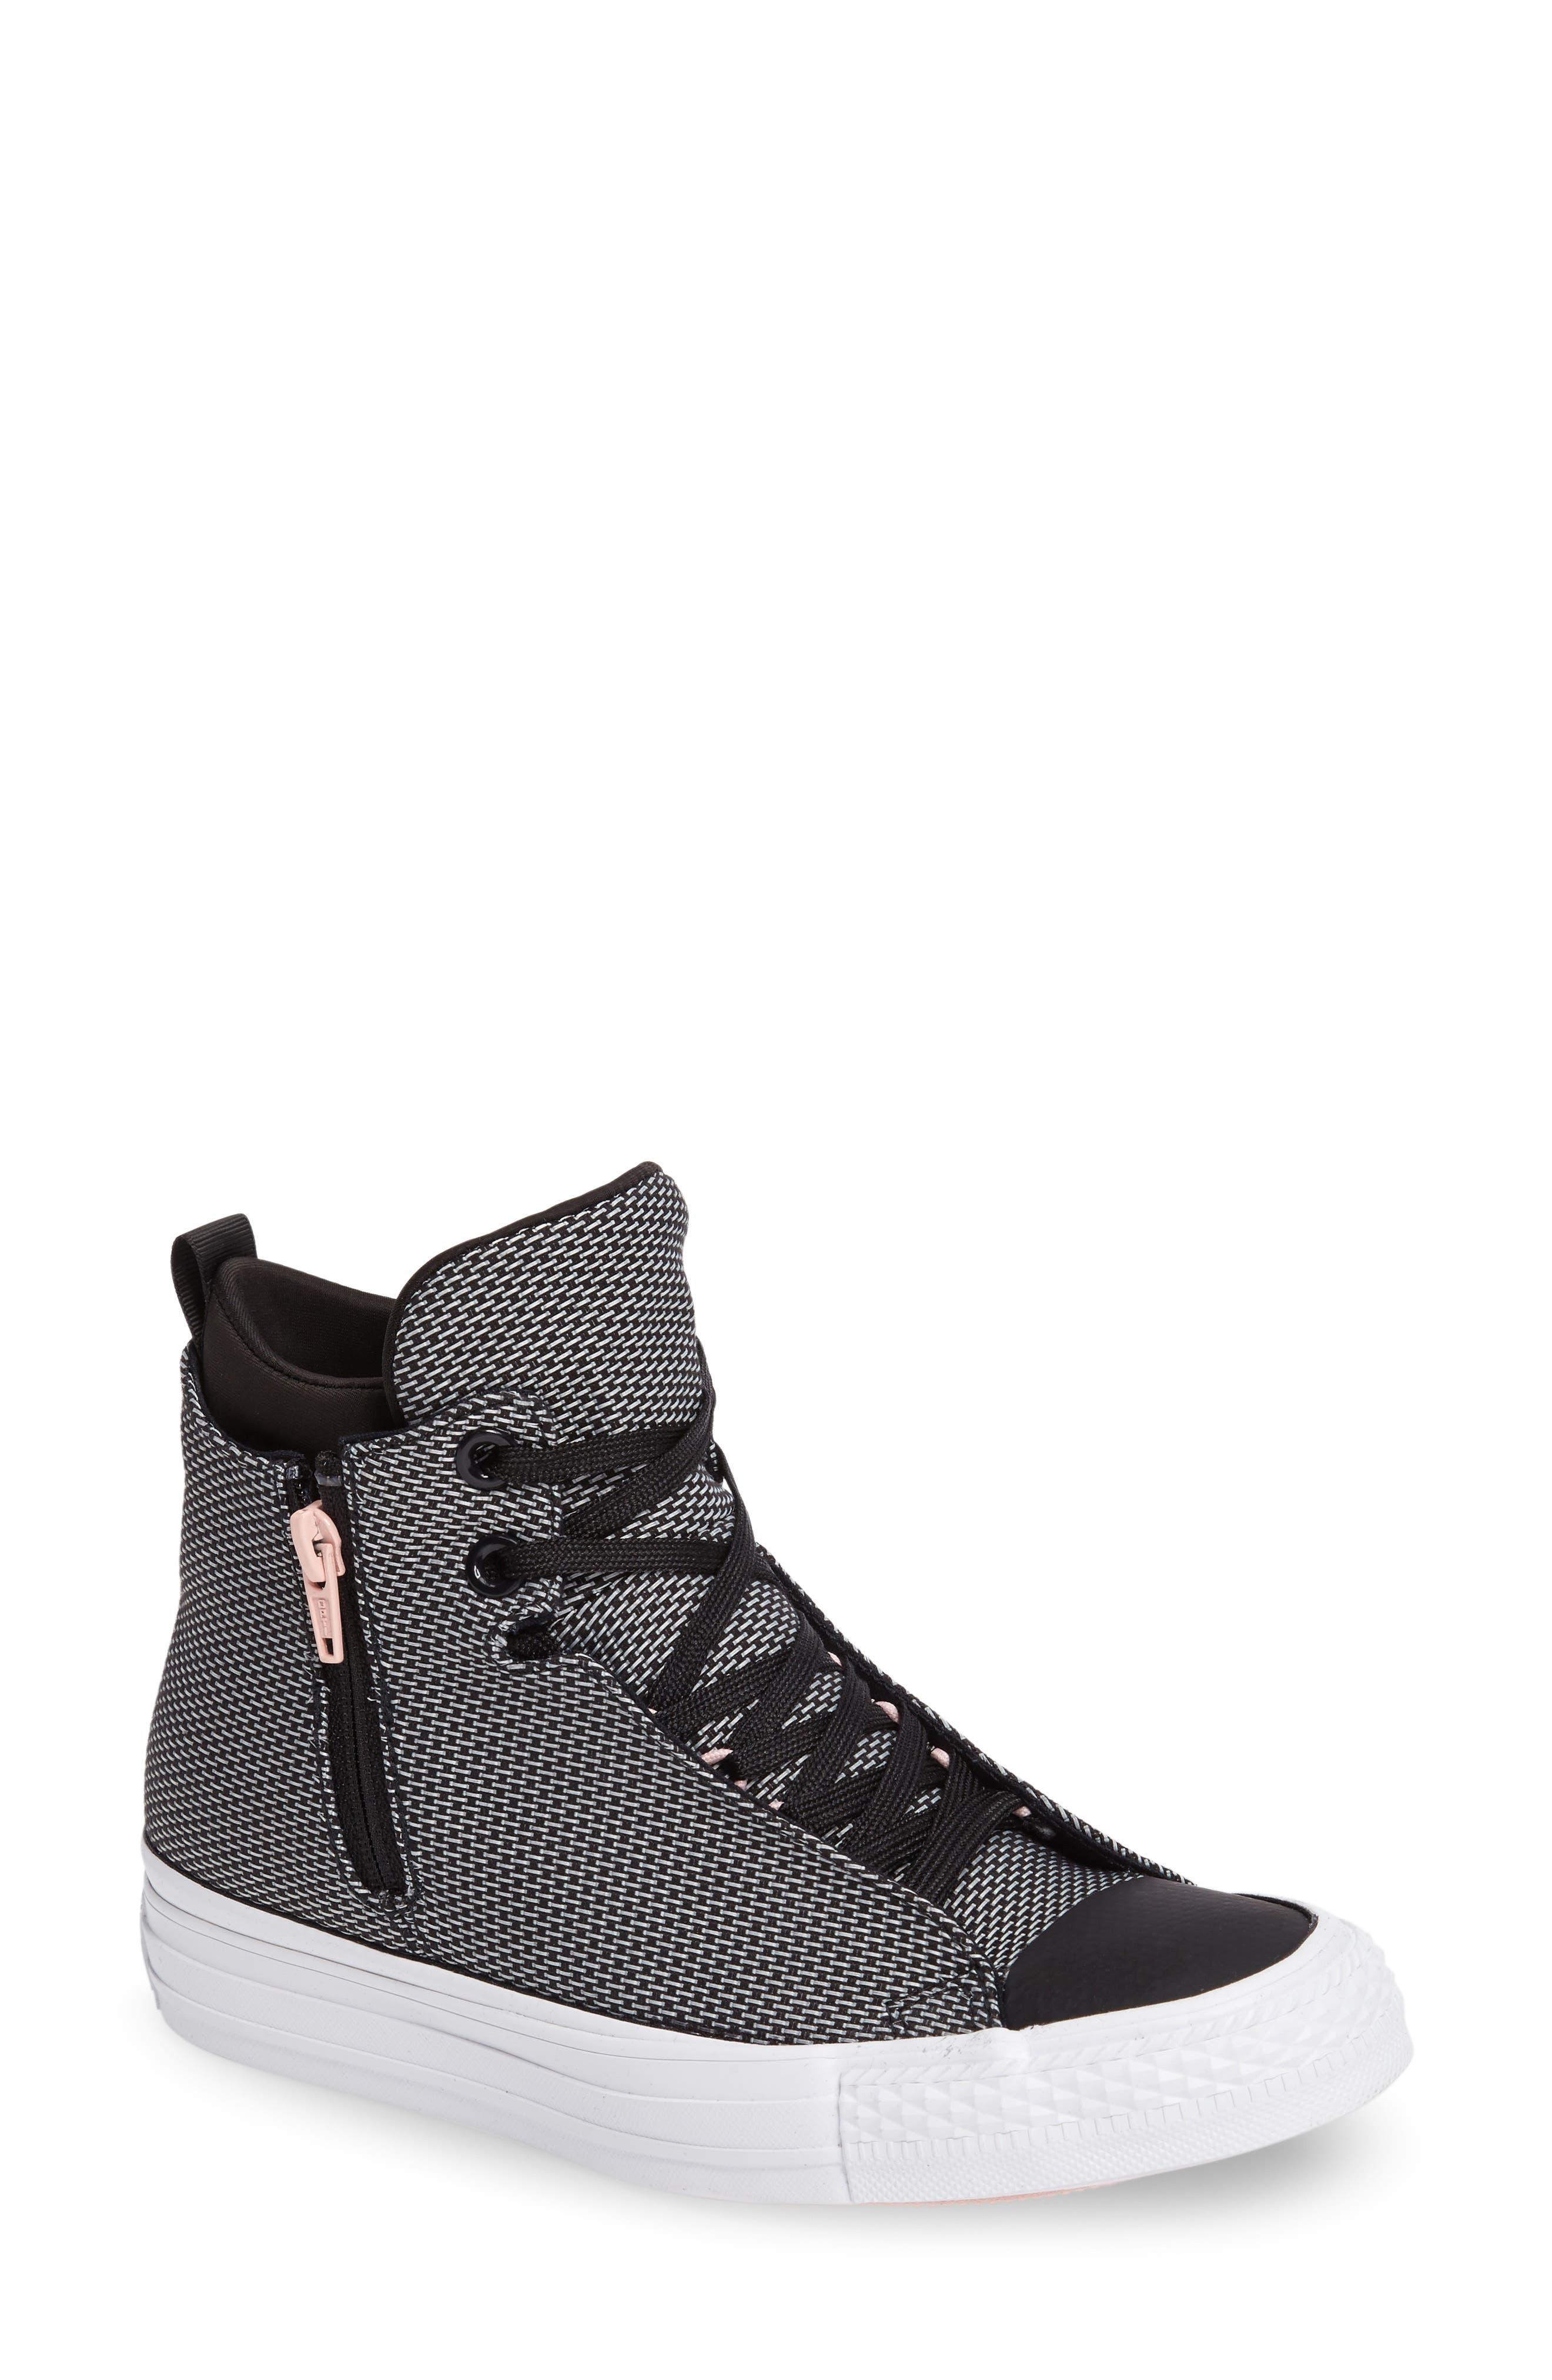 Alternate Image 1 Selected - Converse Chuck Taylor® All Star® Selene High Top Sneaker (Women)